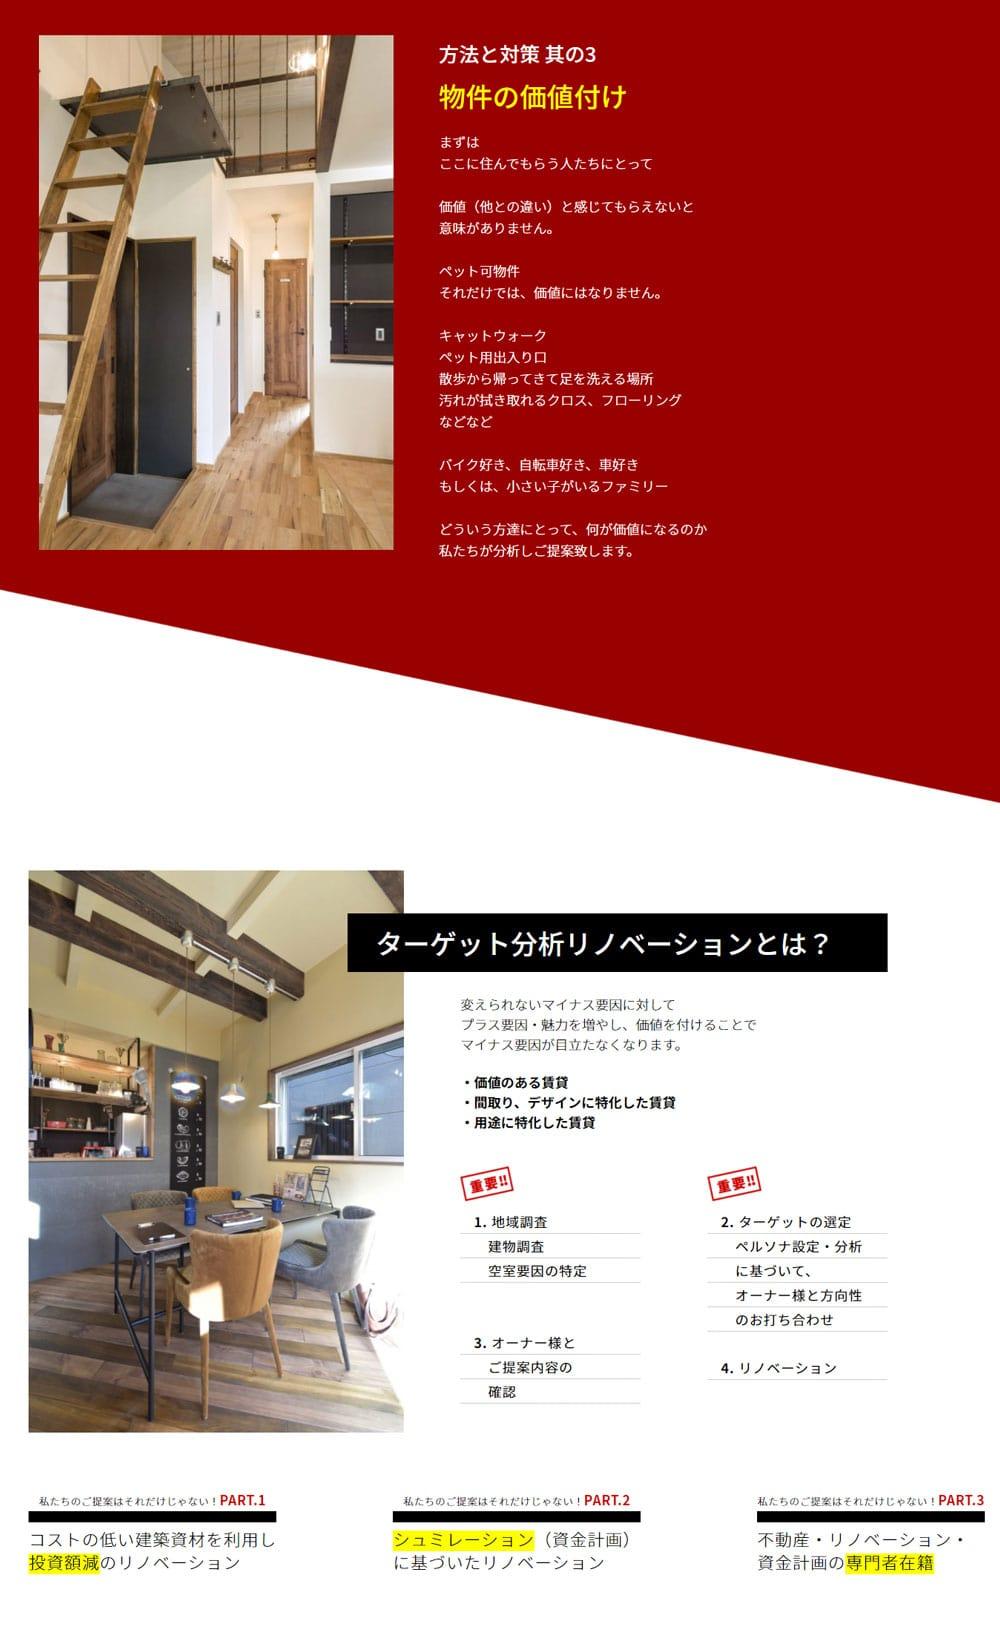 yamagiwa-reform3-min